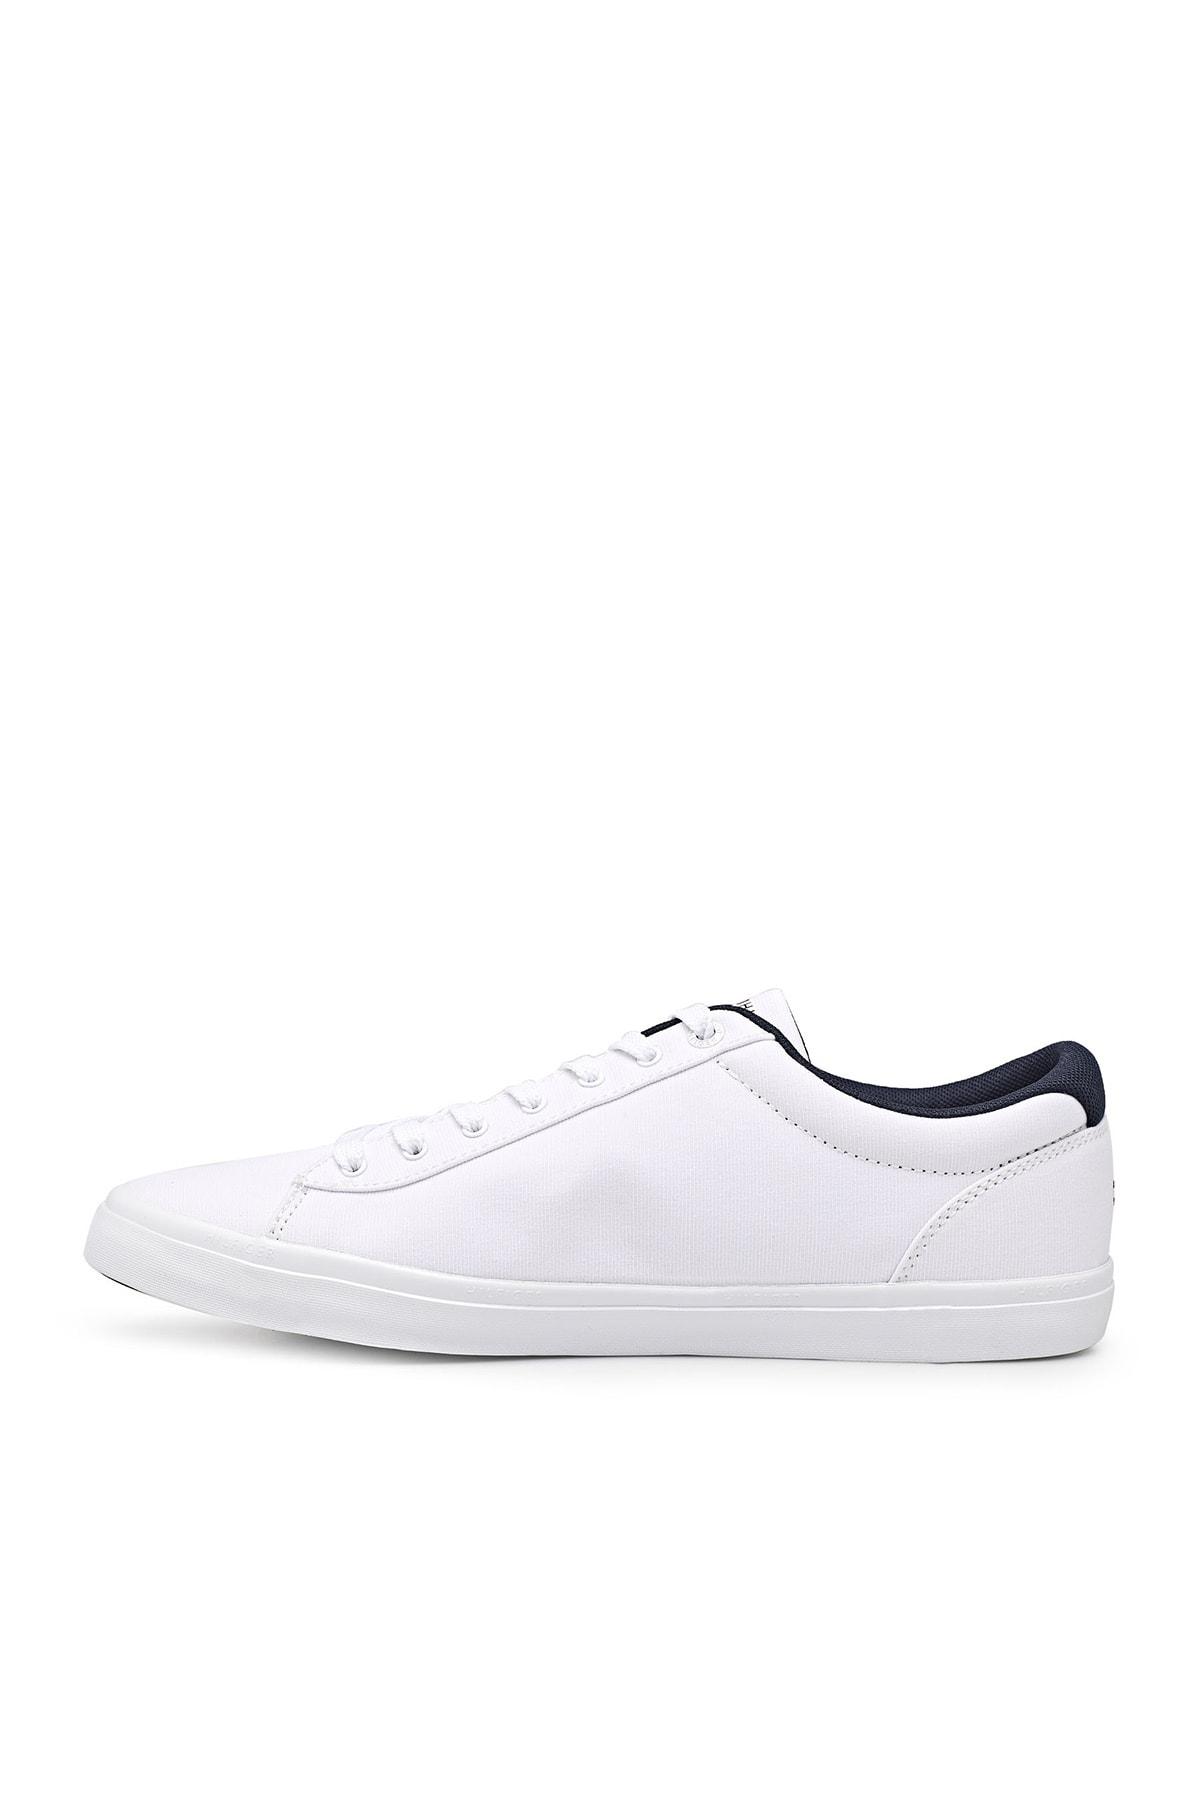 Tommy Hilfiger Erkek Beyaz Sneaker Ayakkabı Fm0fm03389 Ybr 2